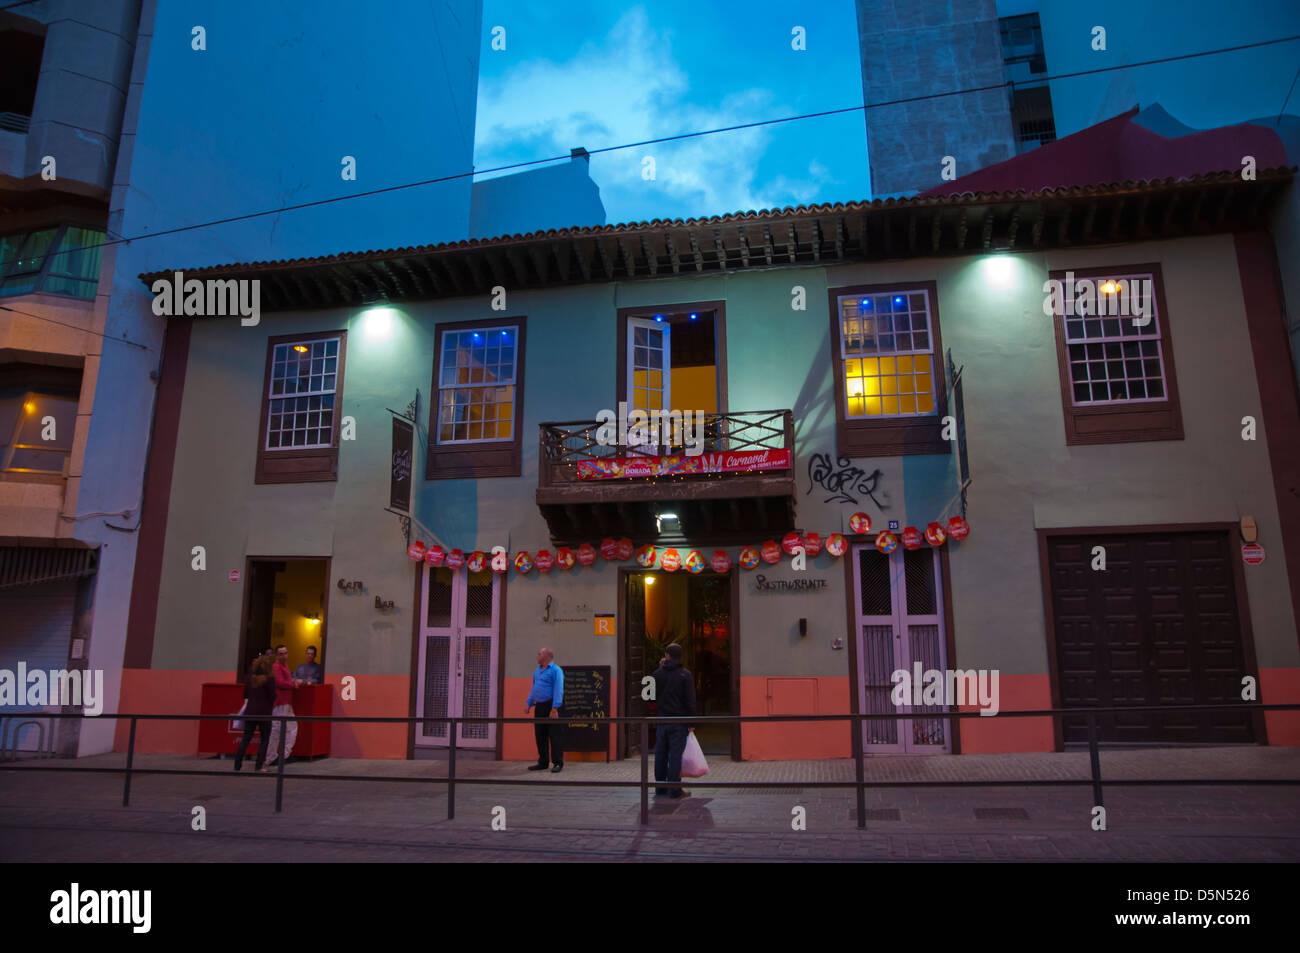 Nightlife along Imeldo Seris street Santa Cruz city Tenerife island Canary Islands Spain - Stock Image